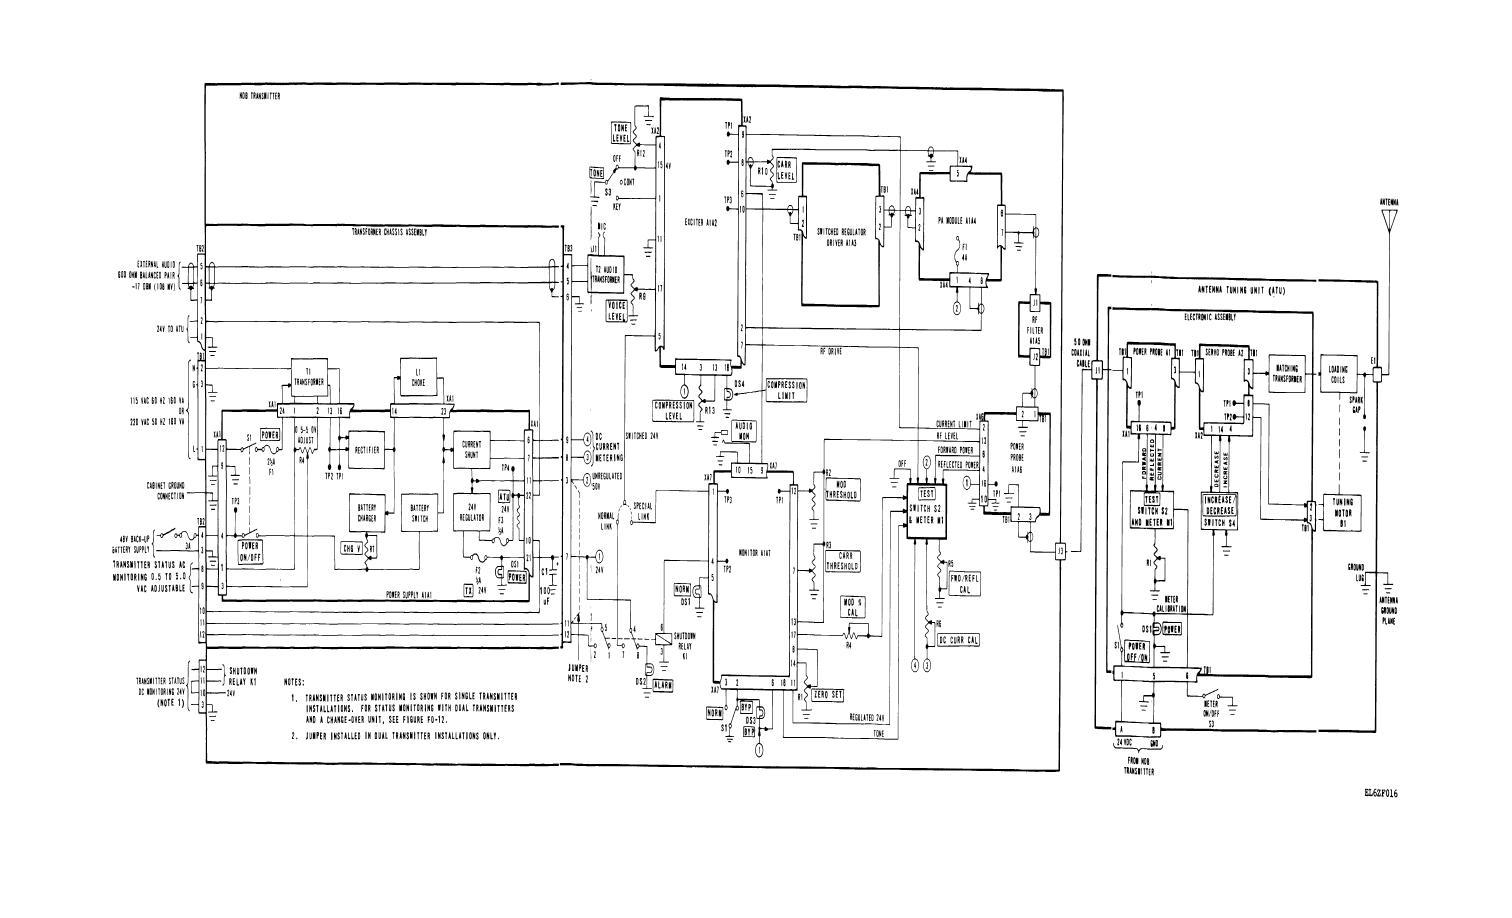 Fo 1 Single Transmitter Installation Interconnection Diagram